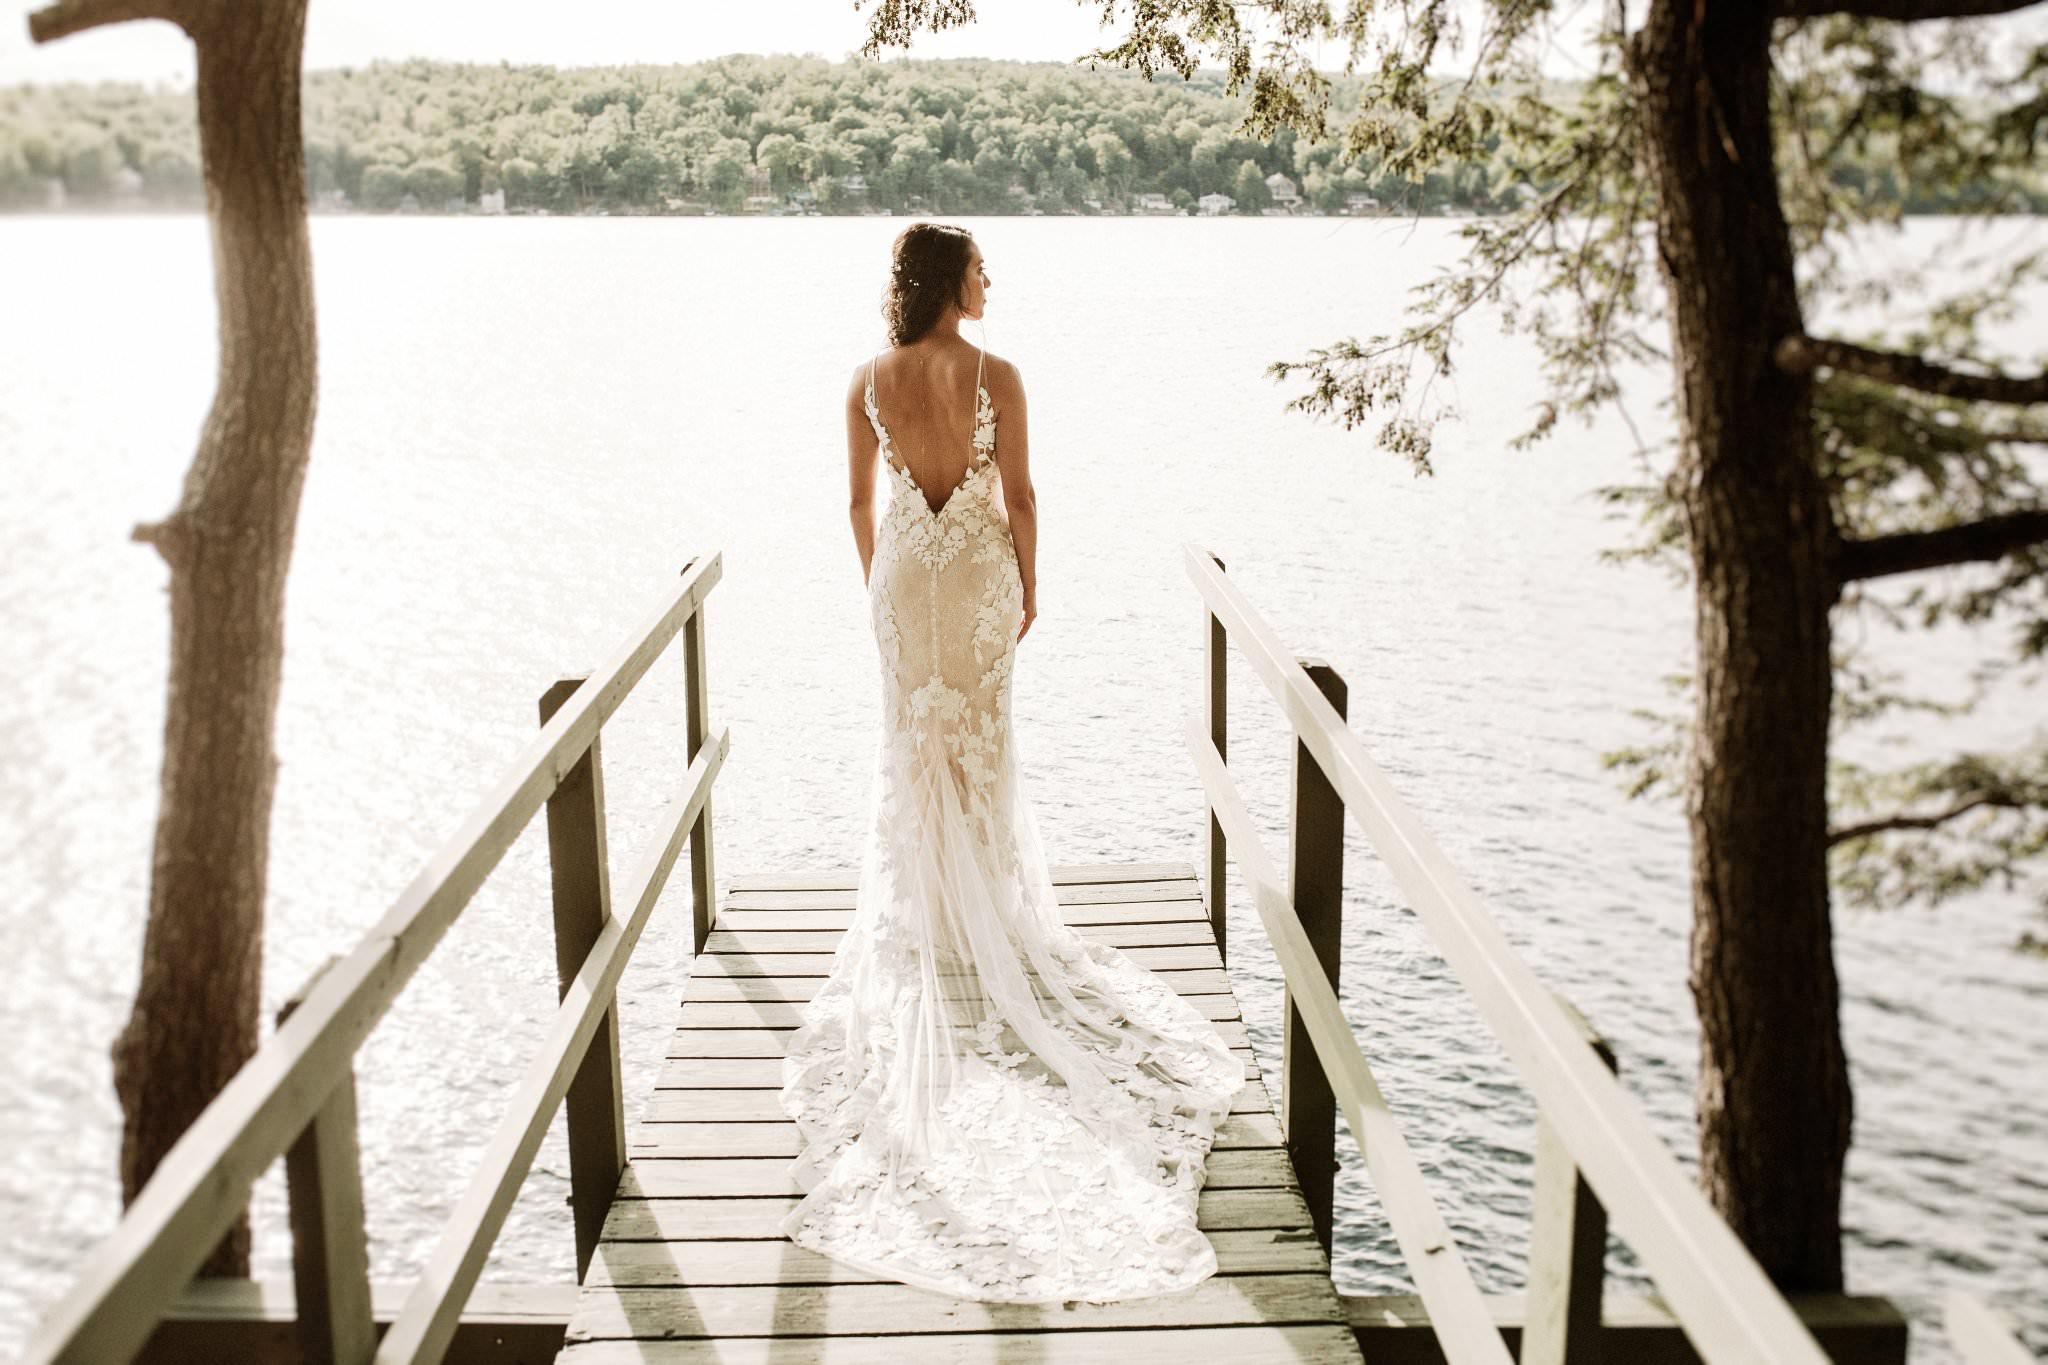 jose melgarejo brooklyn wedding photographer 16